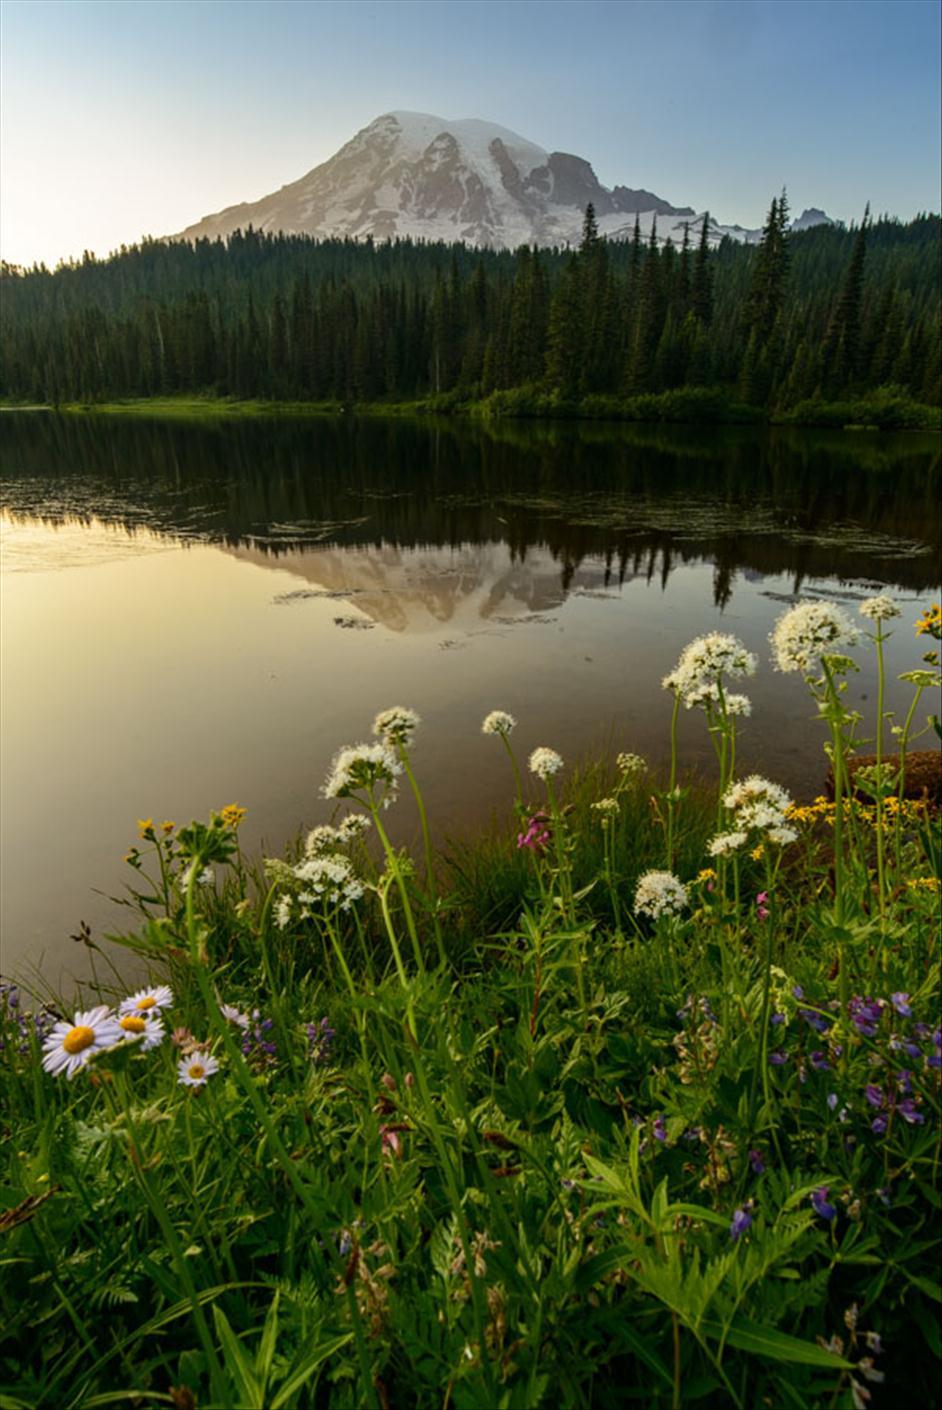 Mount Rainier Wildflowers// Matt Kloskowski's Top 5 Landscapes to Photography // Nations Photo Lab